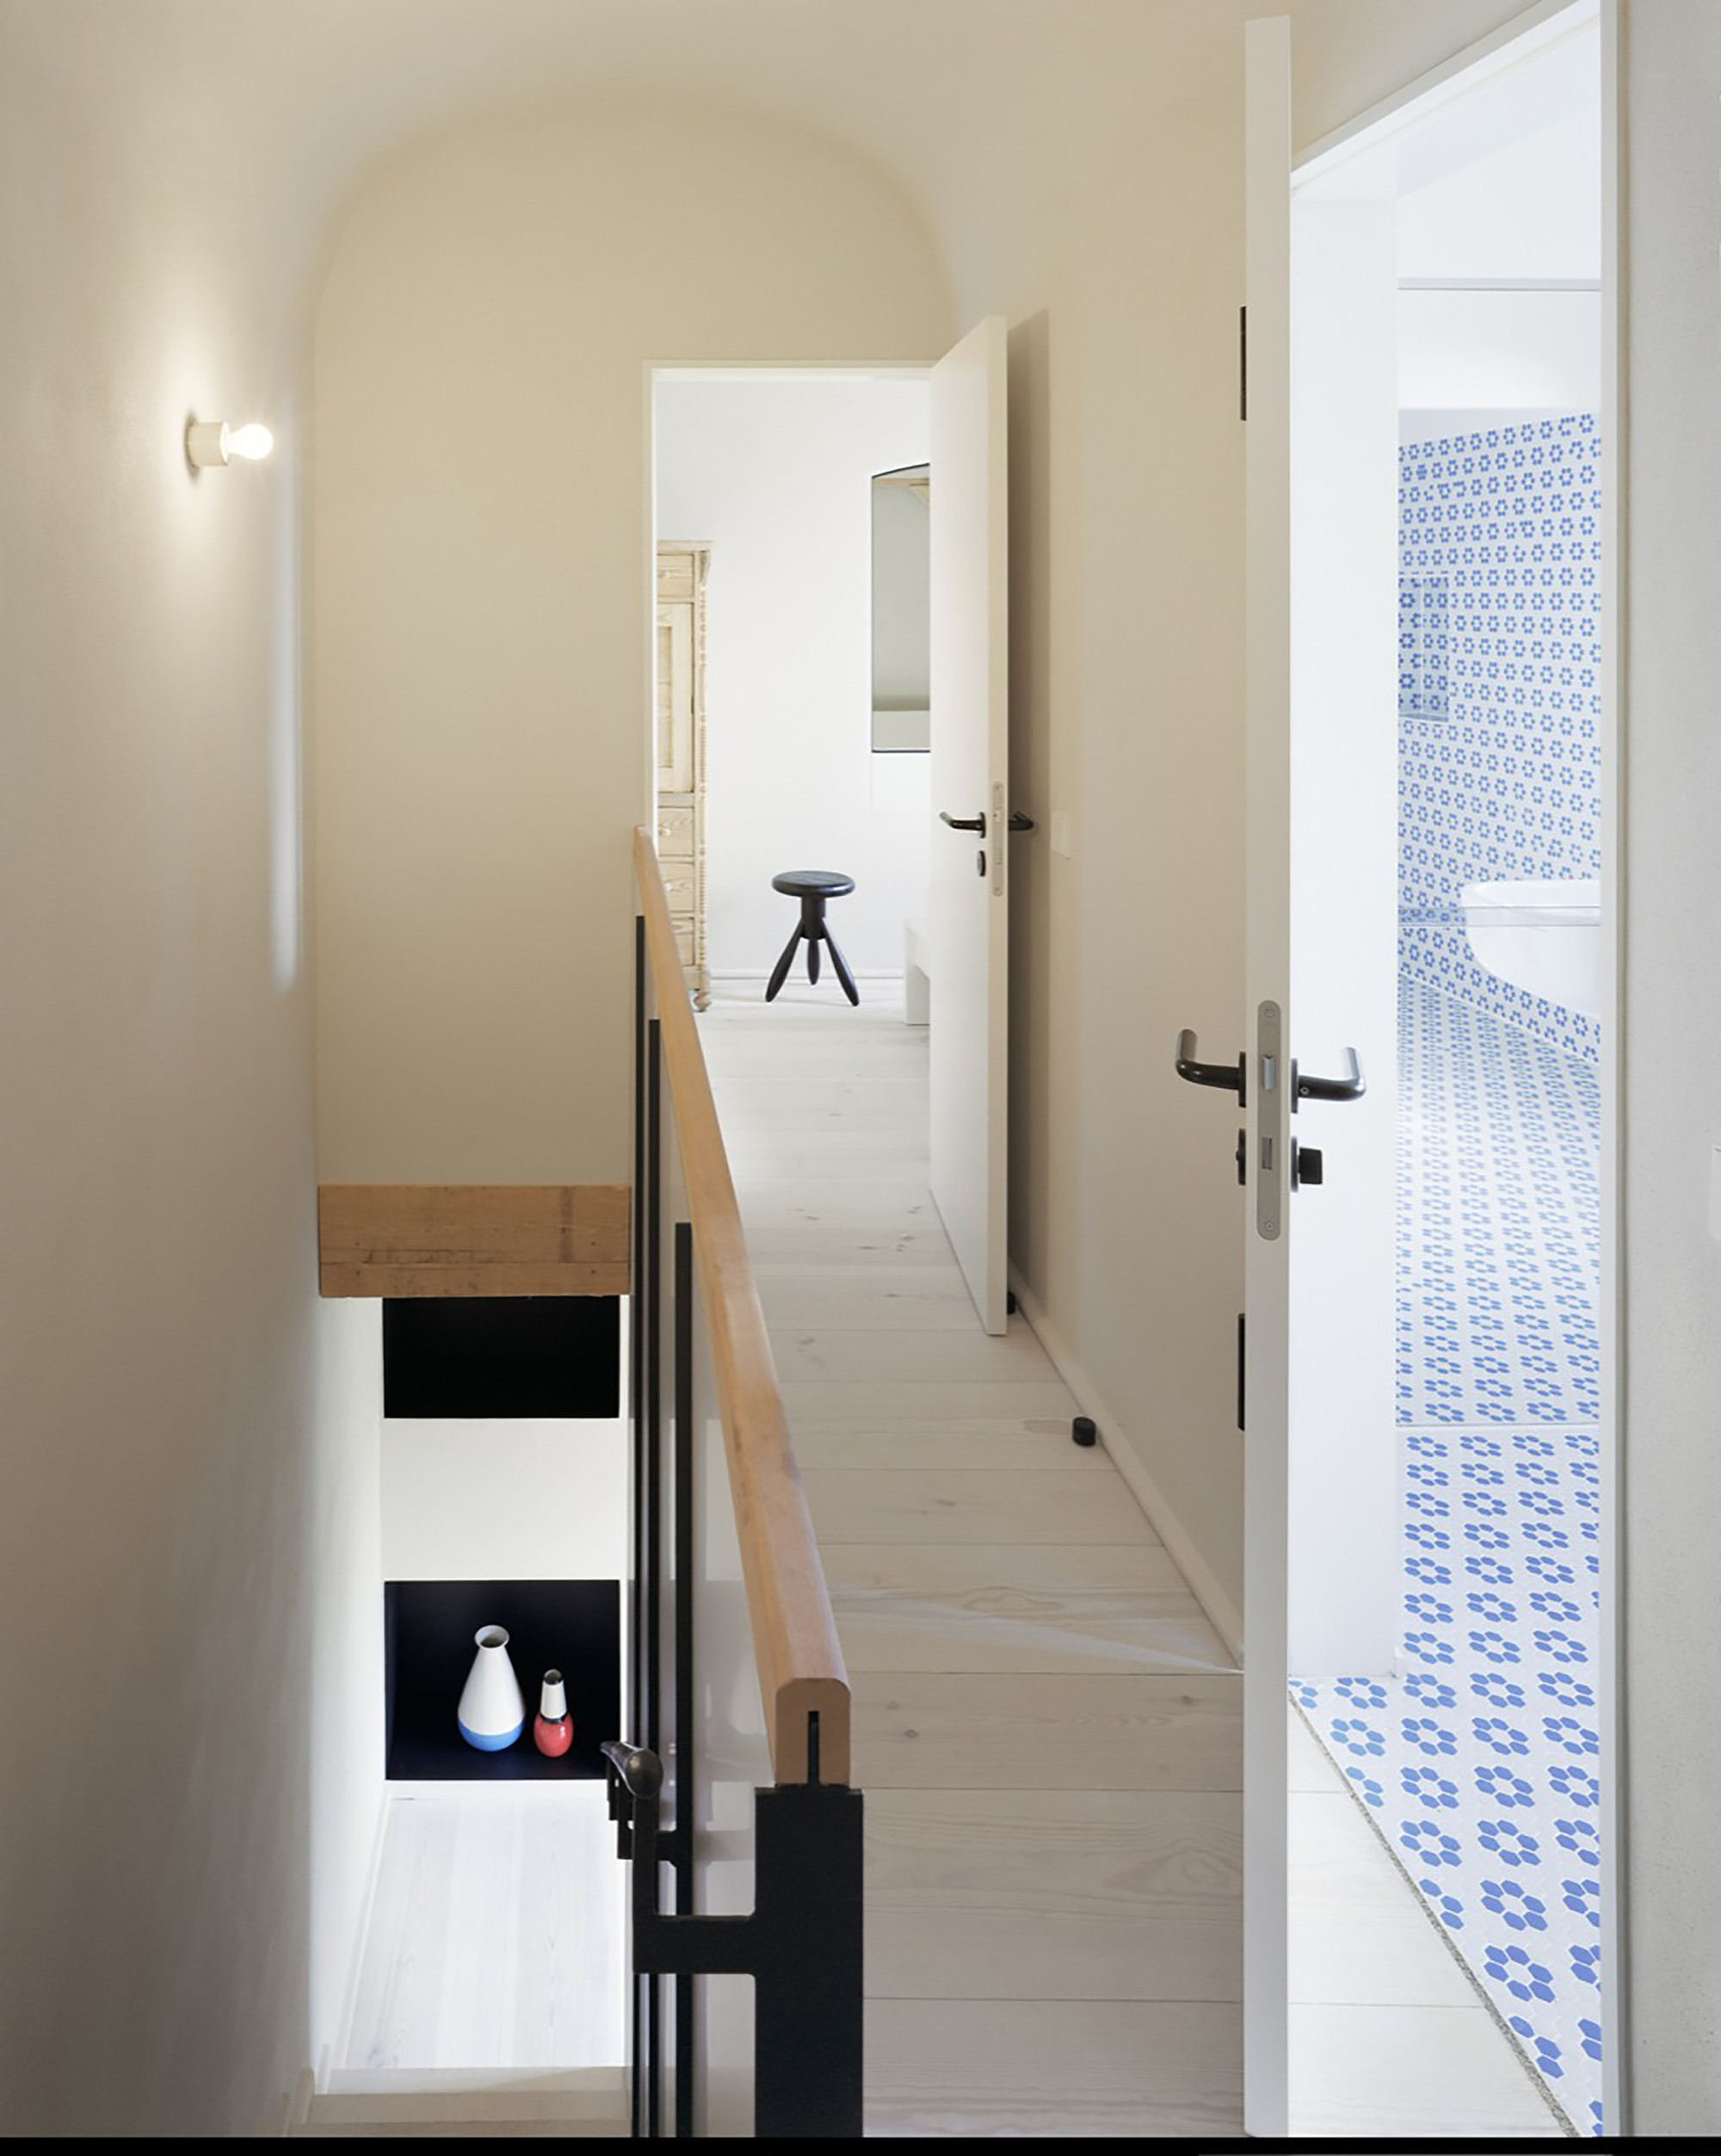 gallery of landhaus thomas kr ger architekt 2. Black Bedroom Furniture Sets. Home Design Ideas